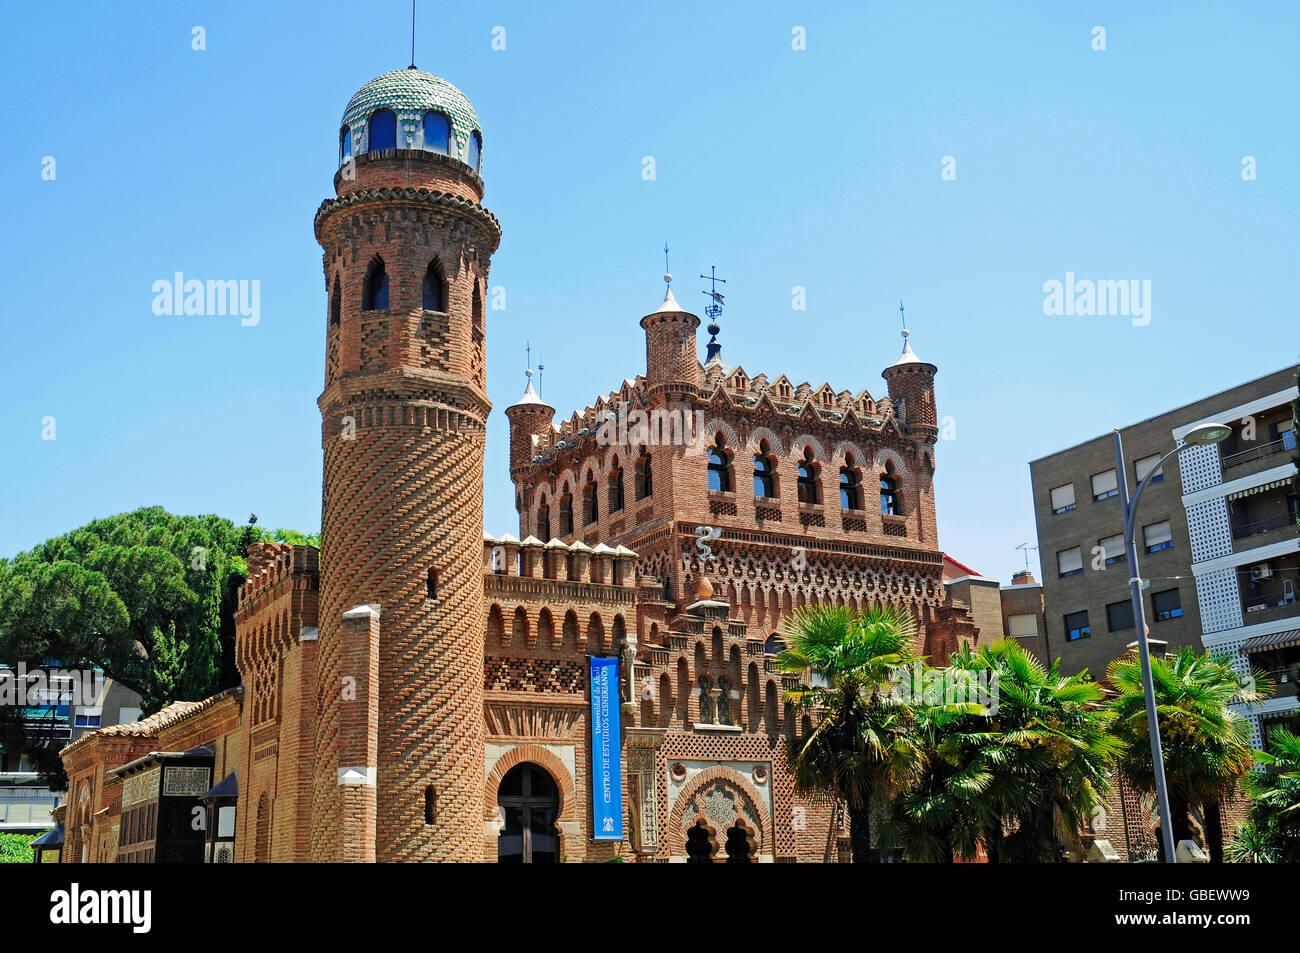 Palace of laredo museum university building alcala de - Arquitectos alcala de henares ...